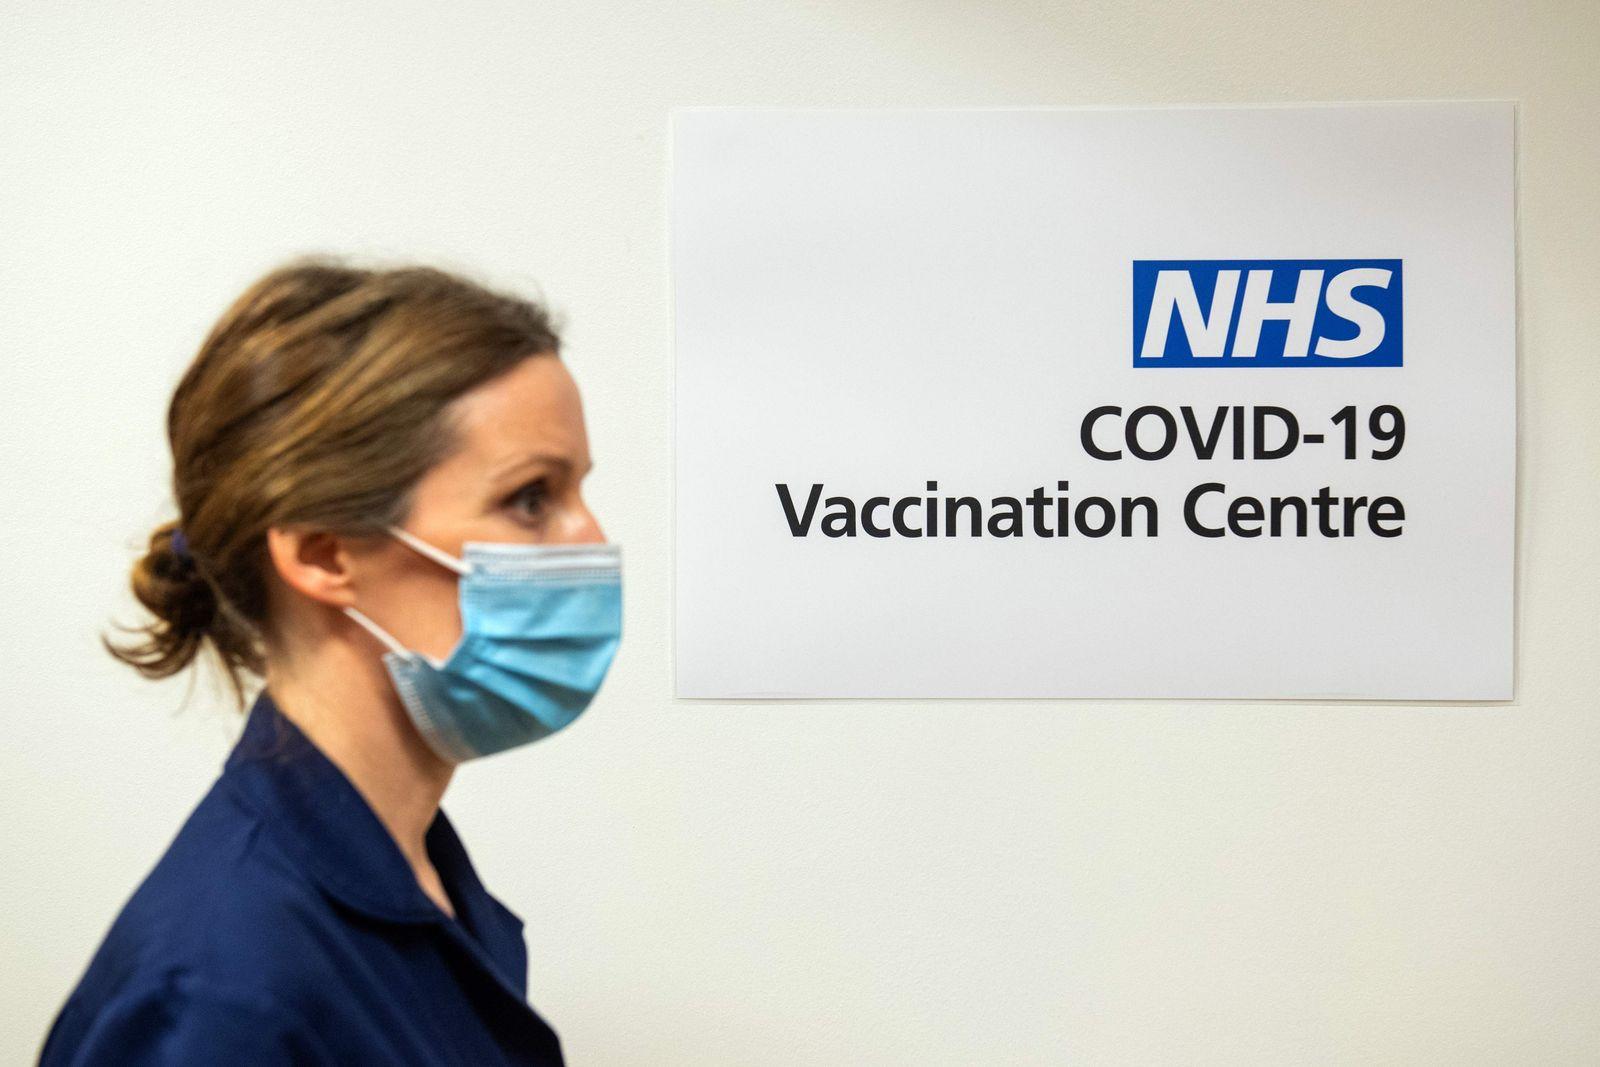 BRITAIN-HEALTH-VIRUS